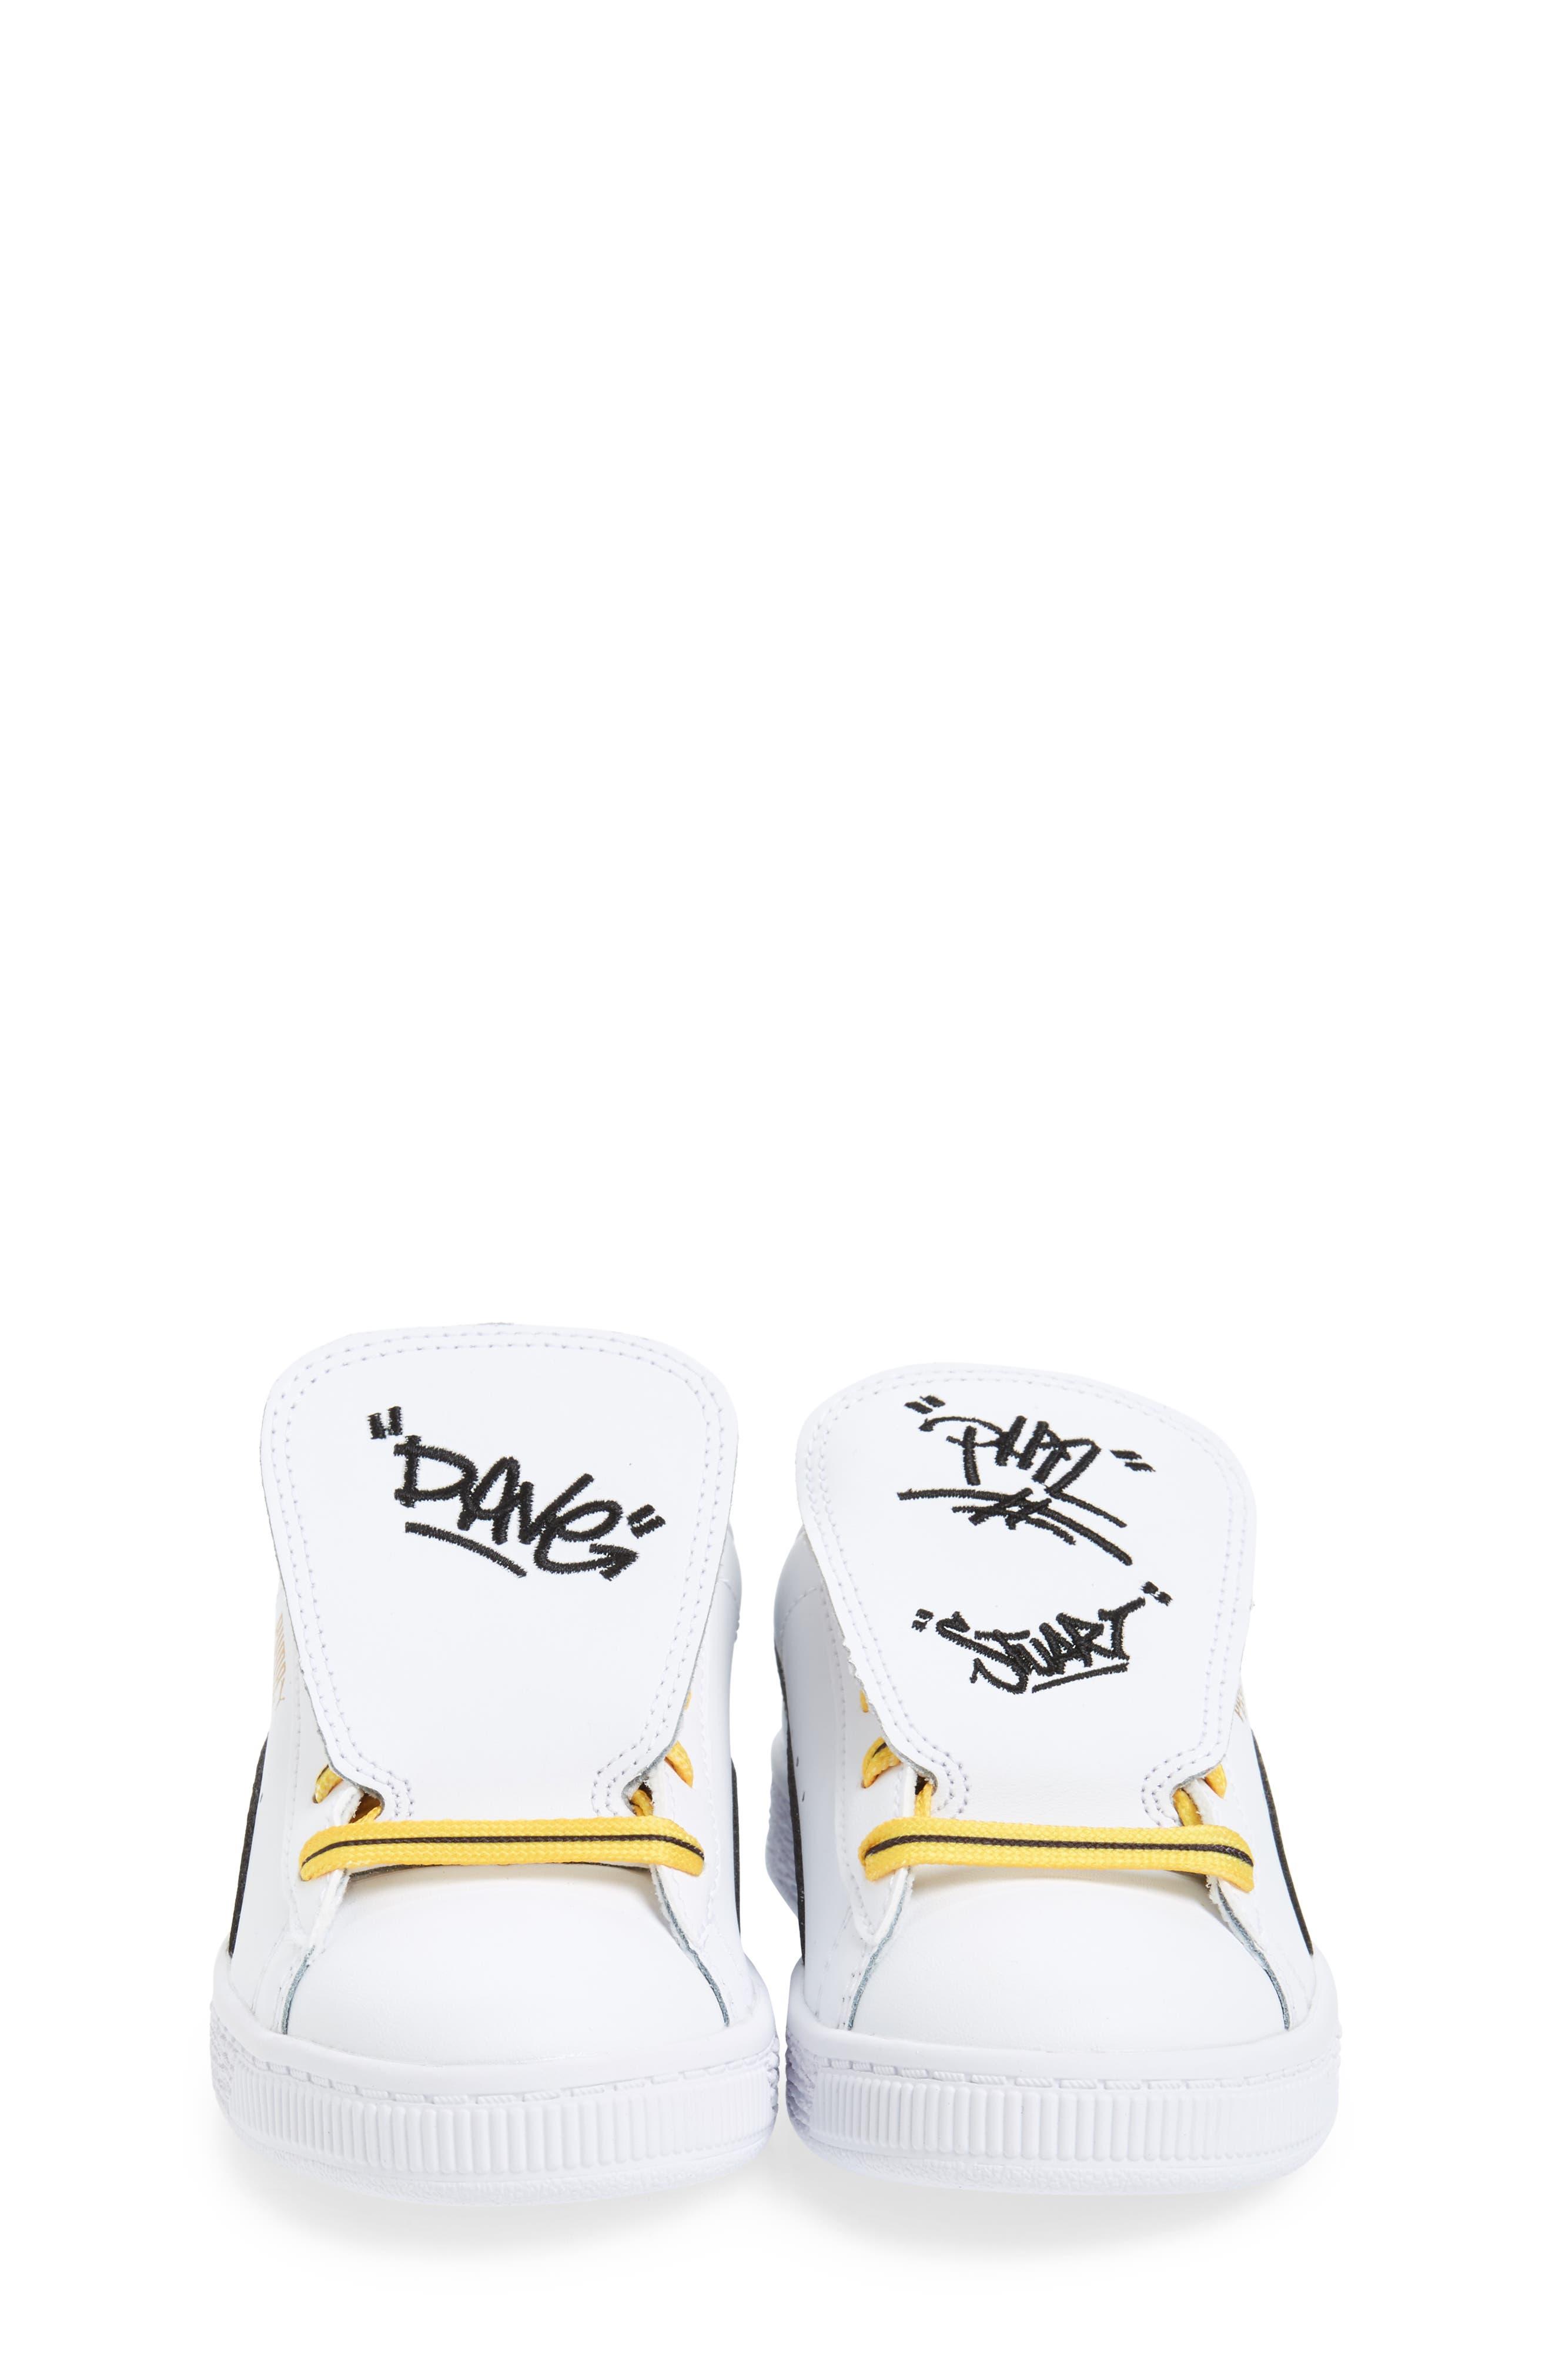 x Minions Basket Embroidered Tongue Sneaker,                             Alternate thumbnail 5, color,                             White/ Black/ Minion Yellow